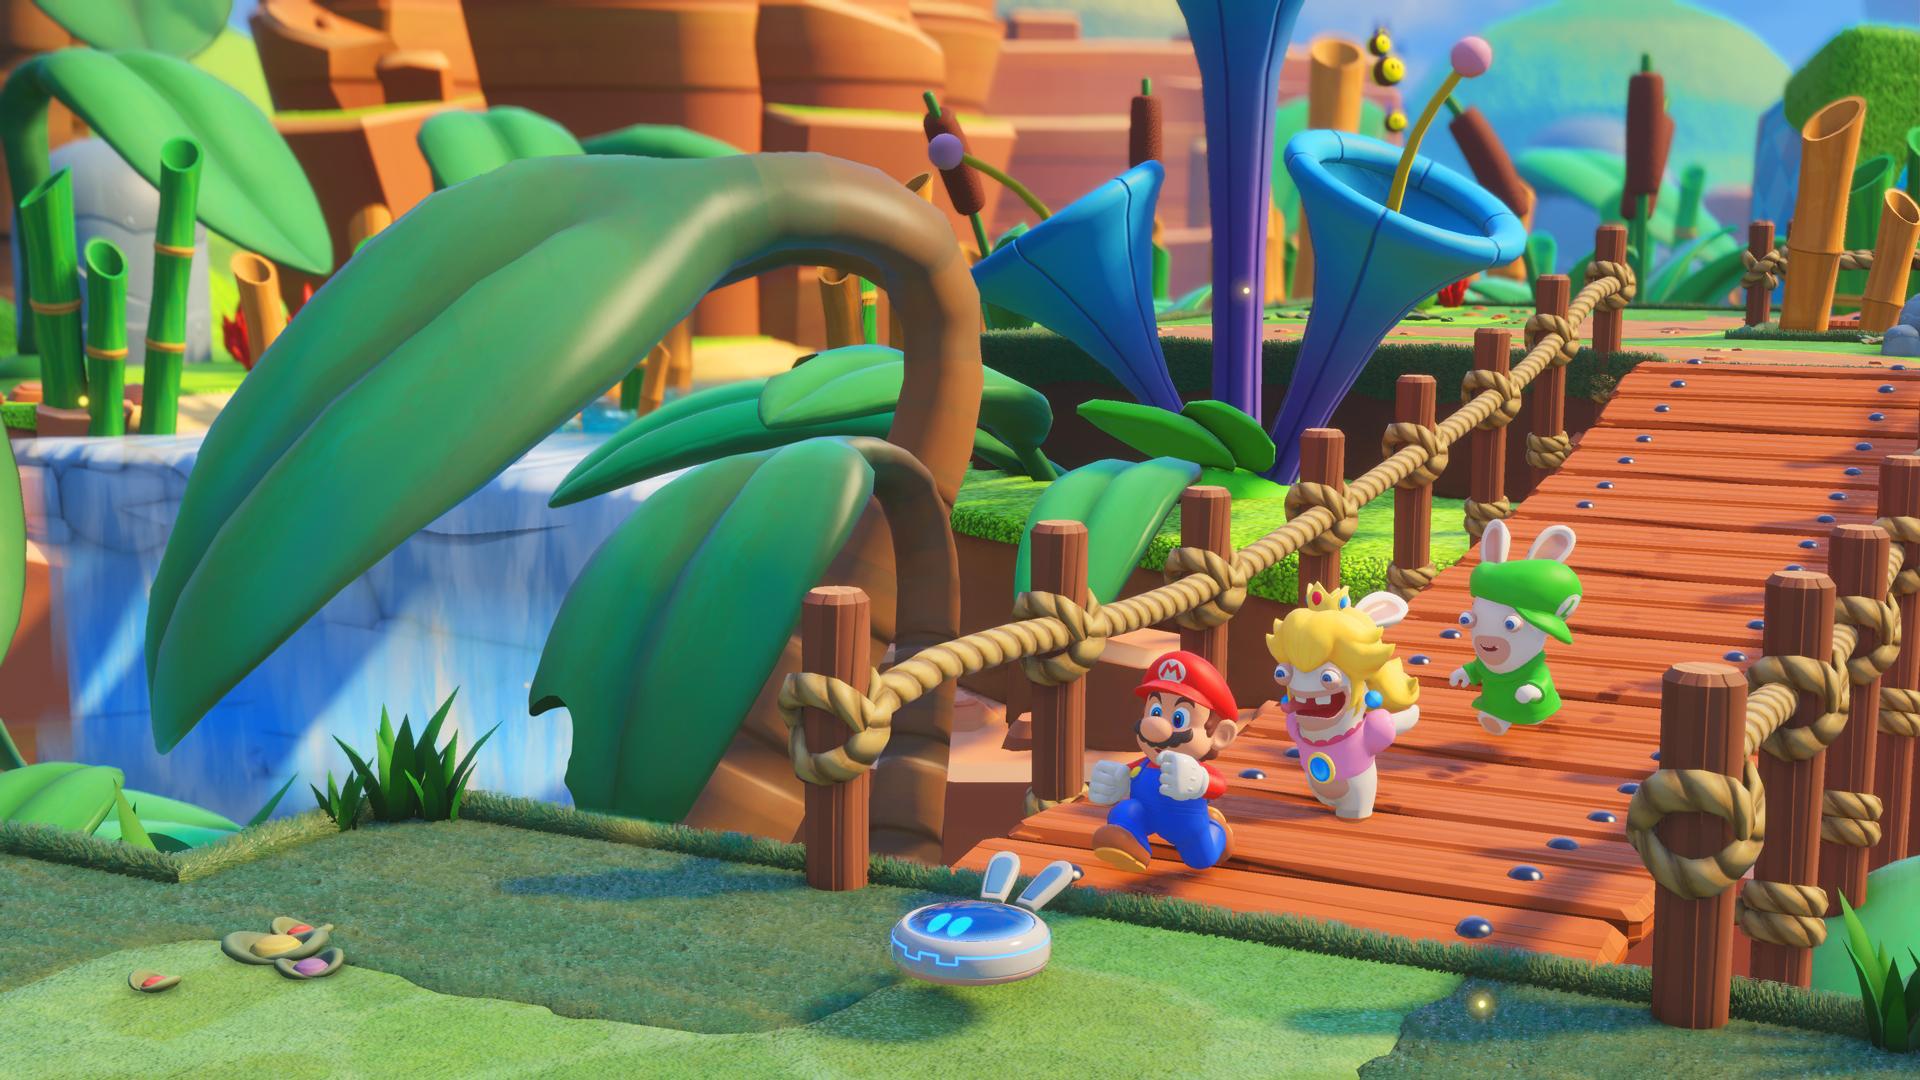 Mario + Rabbids Kingdom Battle is straightforward, but I don't even mind screenshot